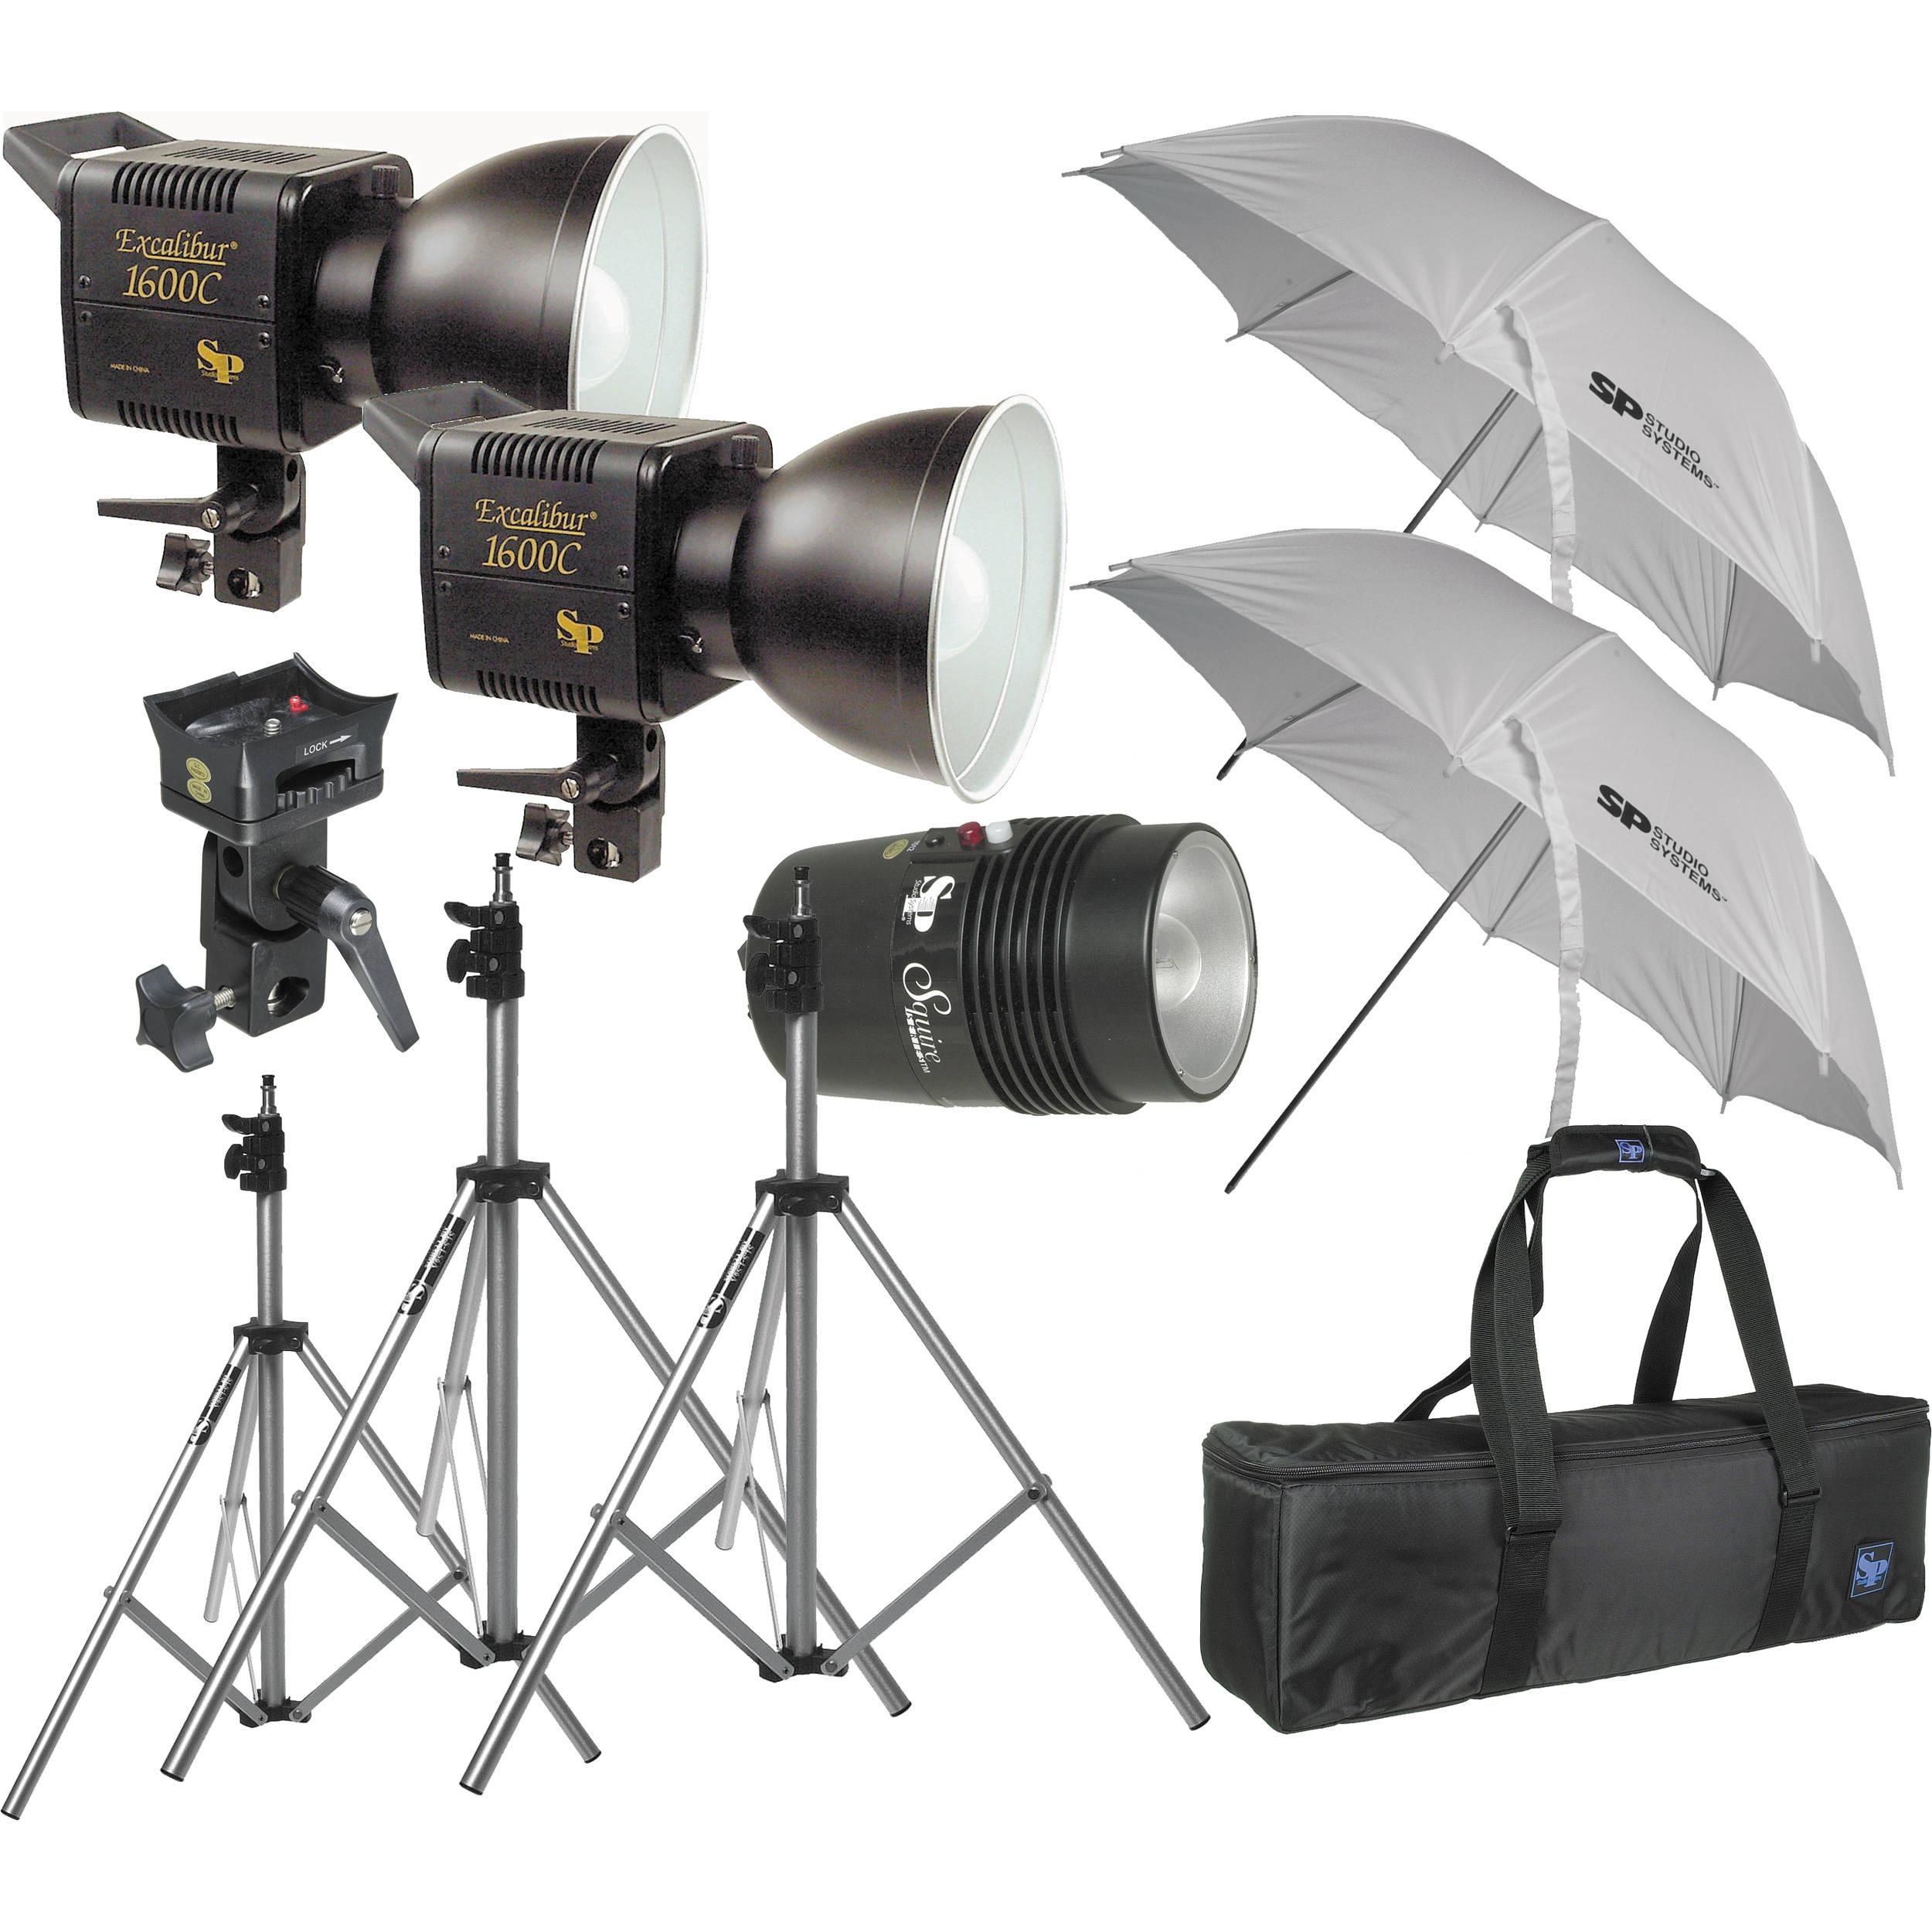 SP Studio Systems Excalibur Pro 1600 Lighting Kit